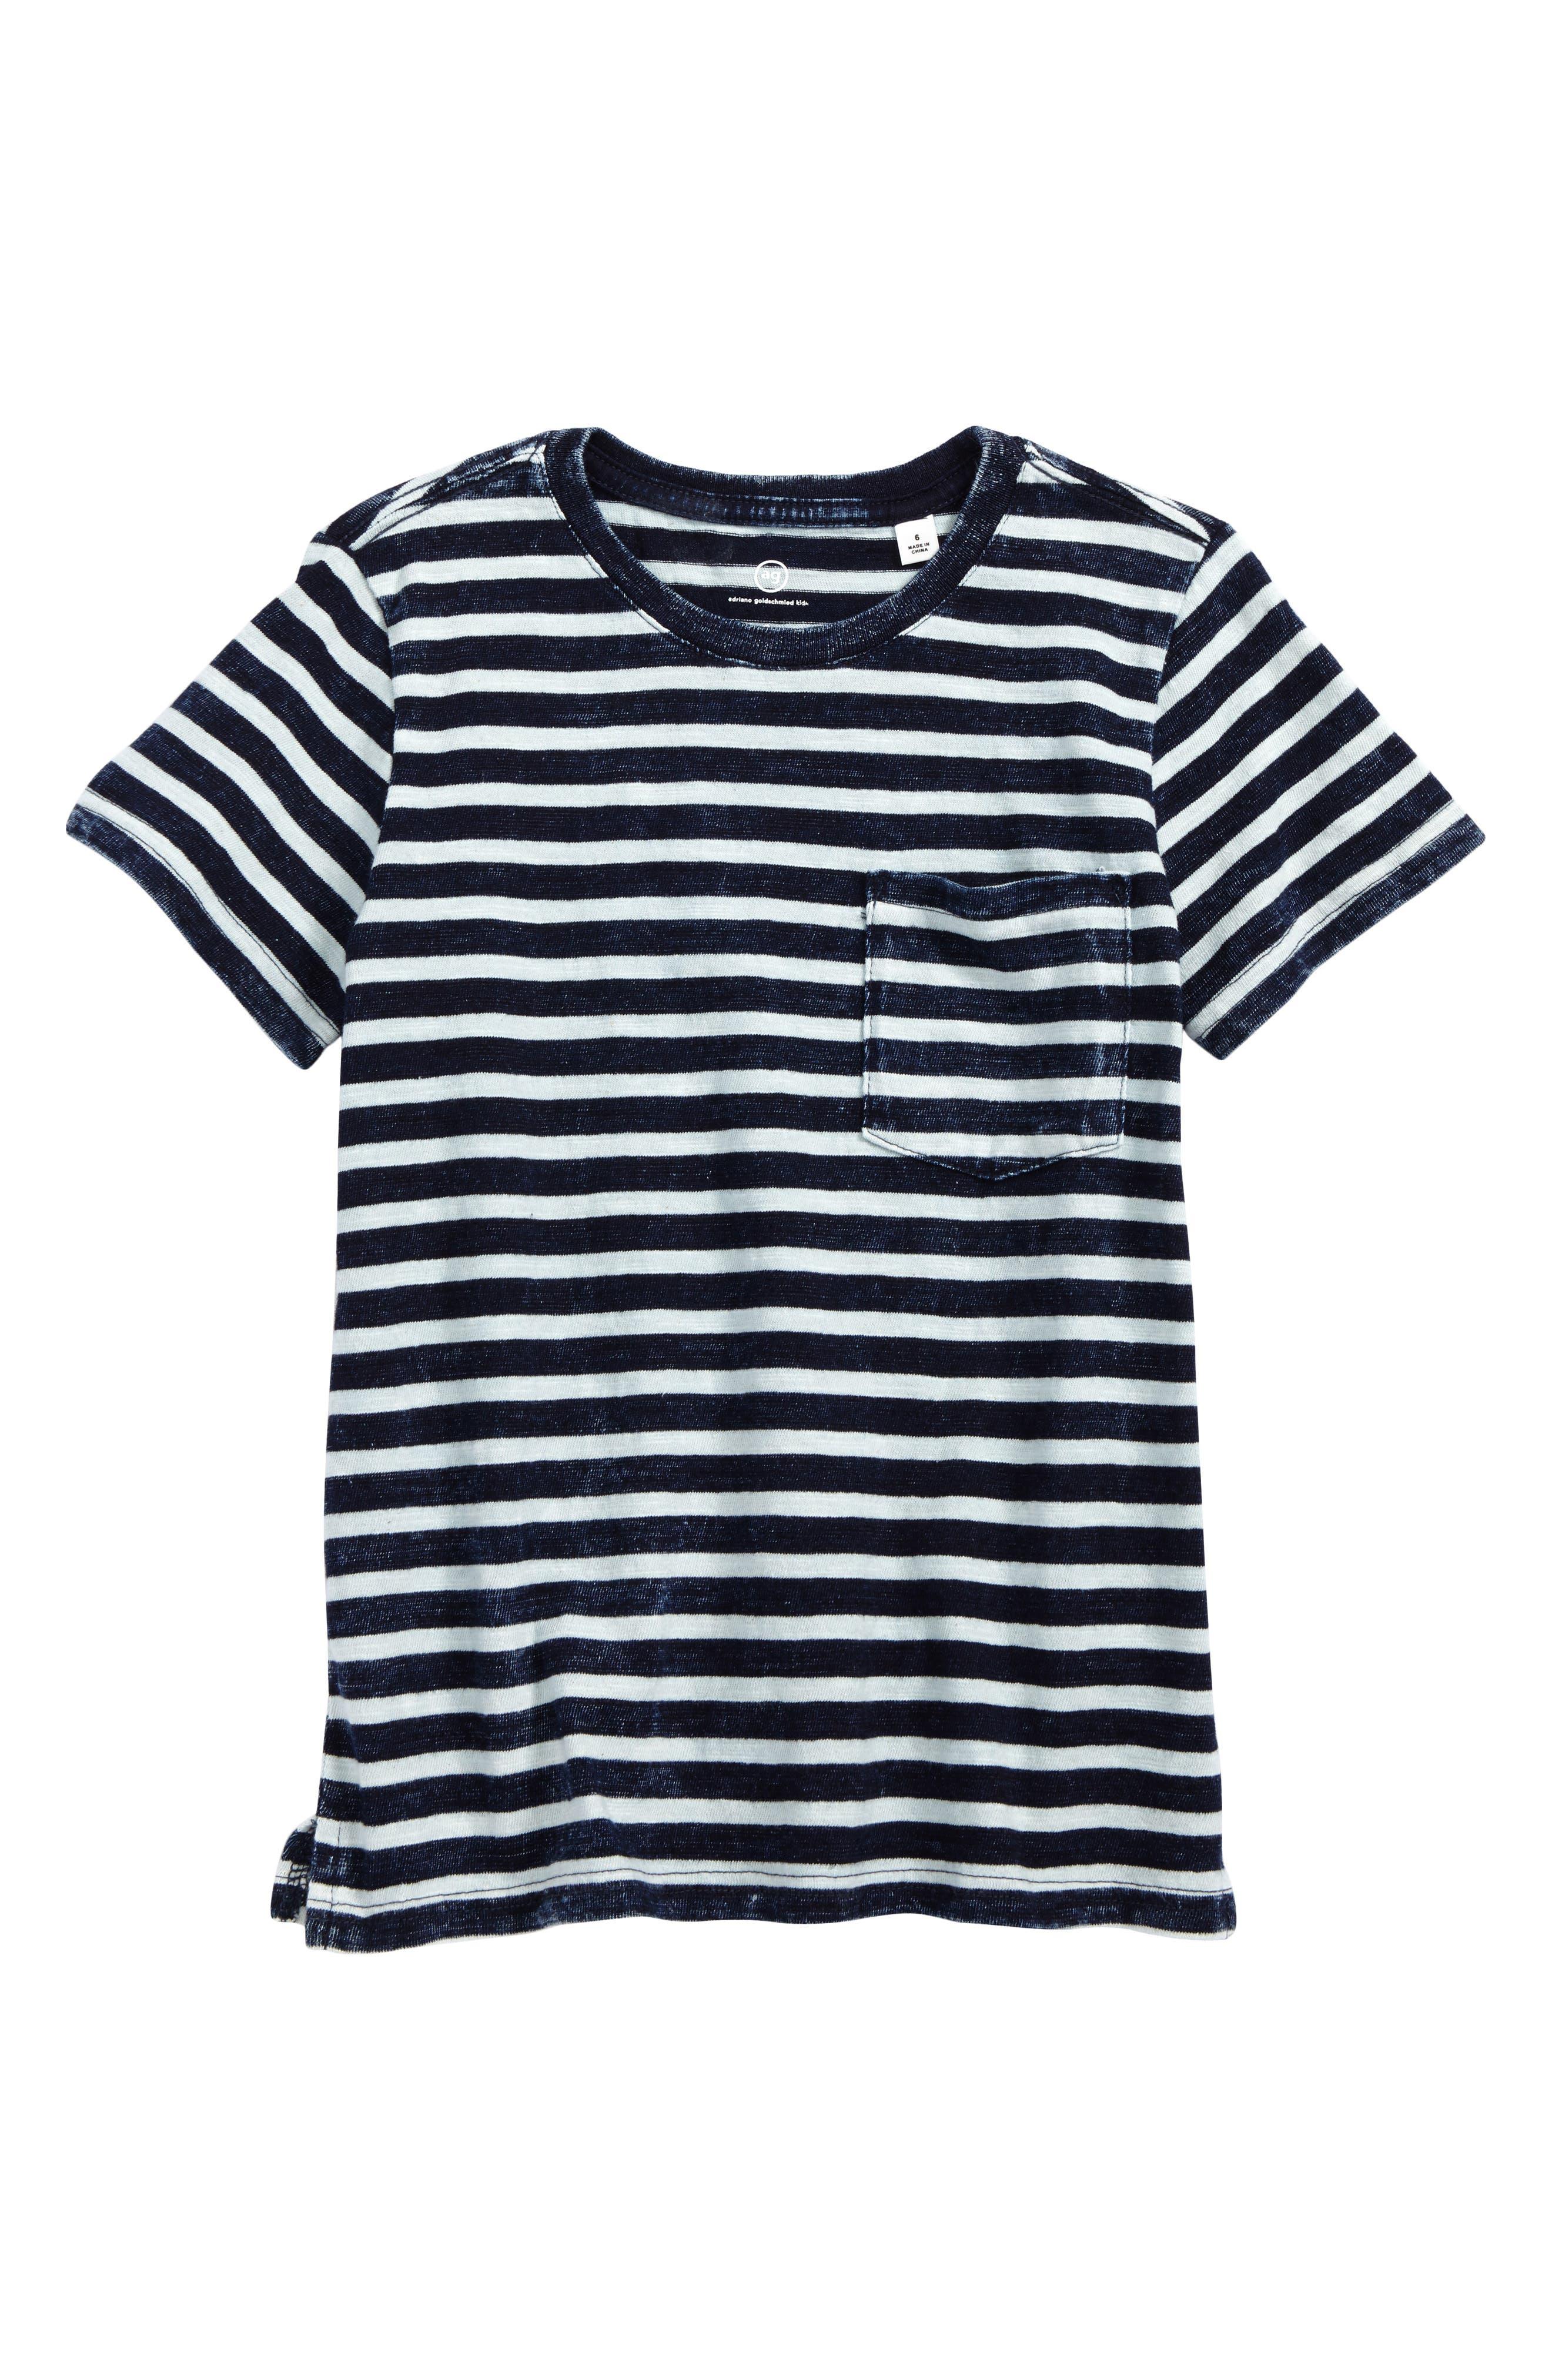 Main Image - ag adriano goldschmied kids Acid Wash Stripe T-Shirt (Toddler Boys & Little Boys)